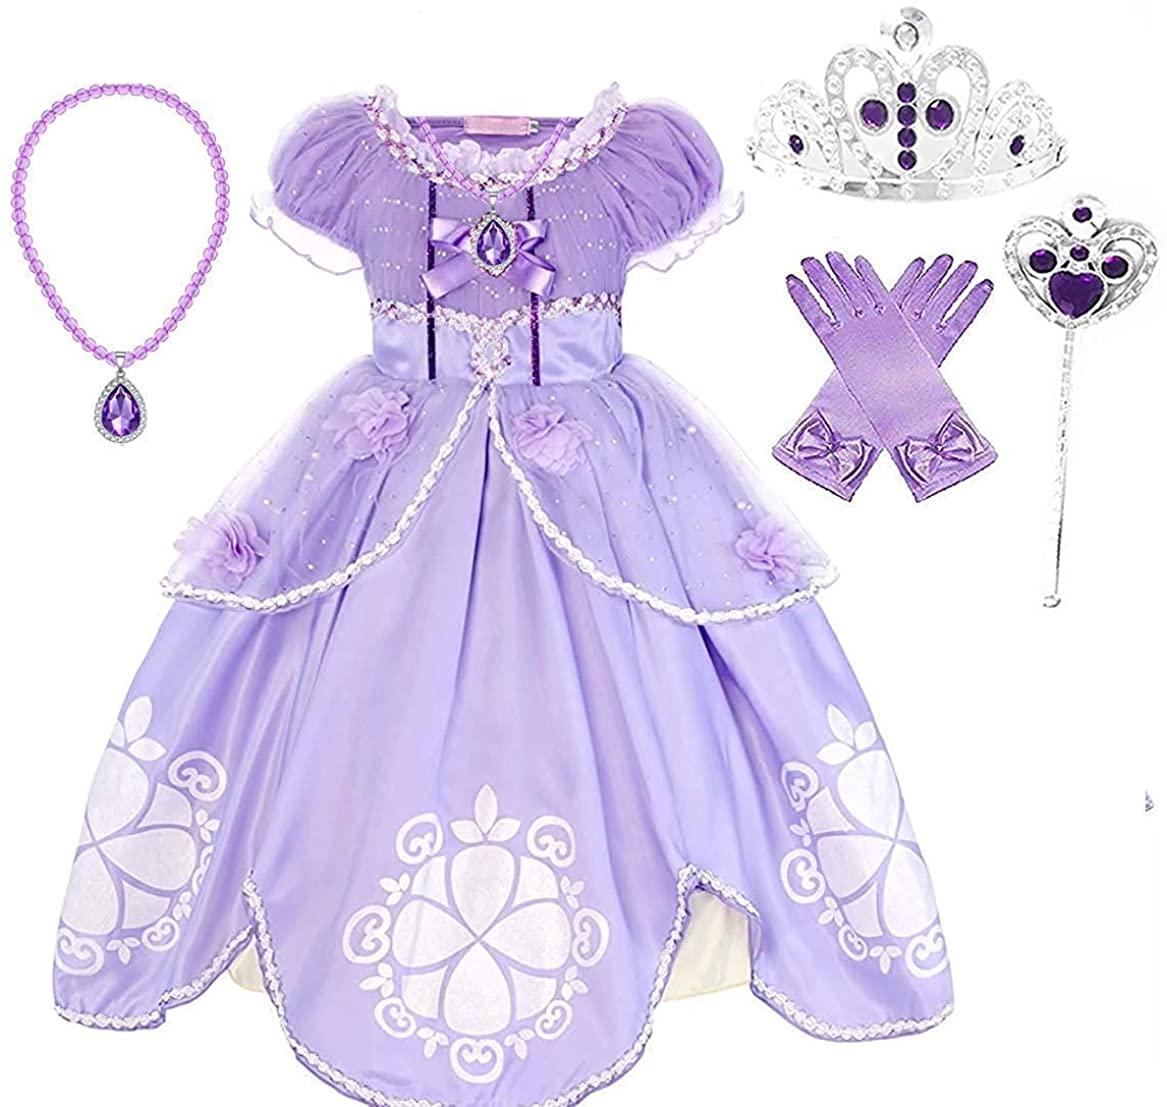 Romy's Collection Princess Amulet Dress Up Costume Dress Set